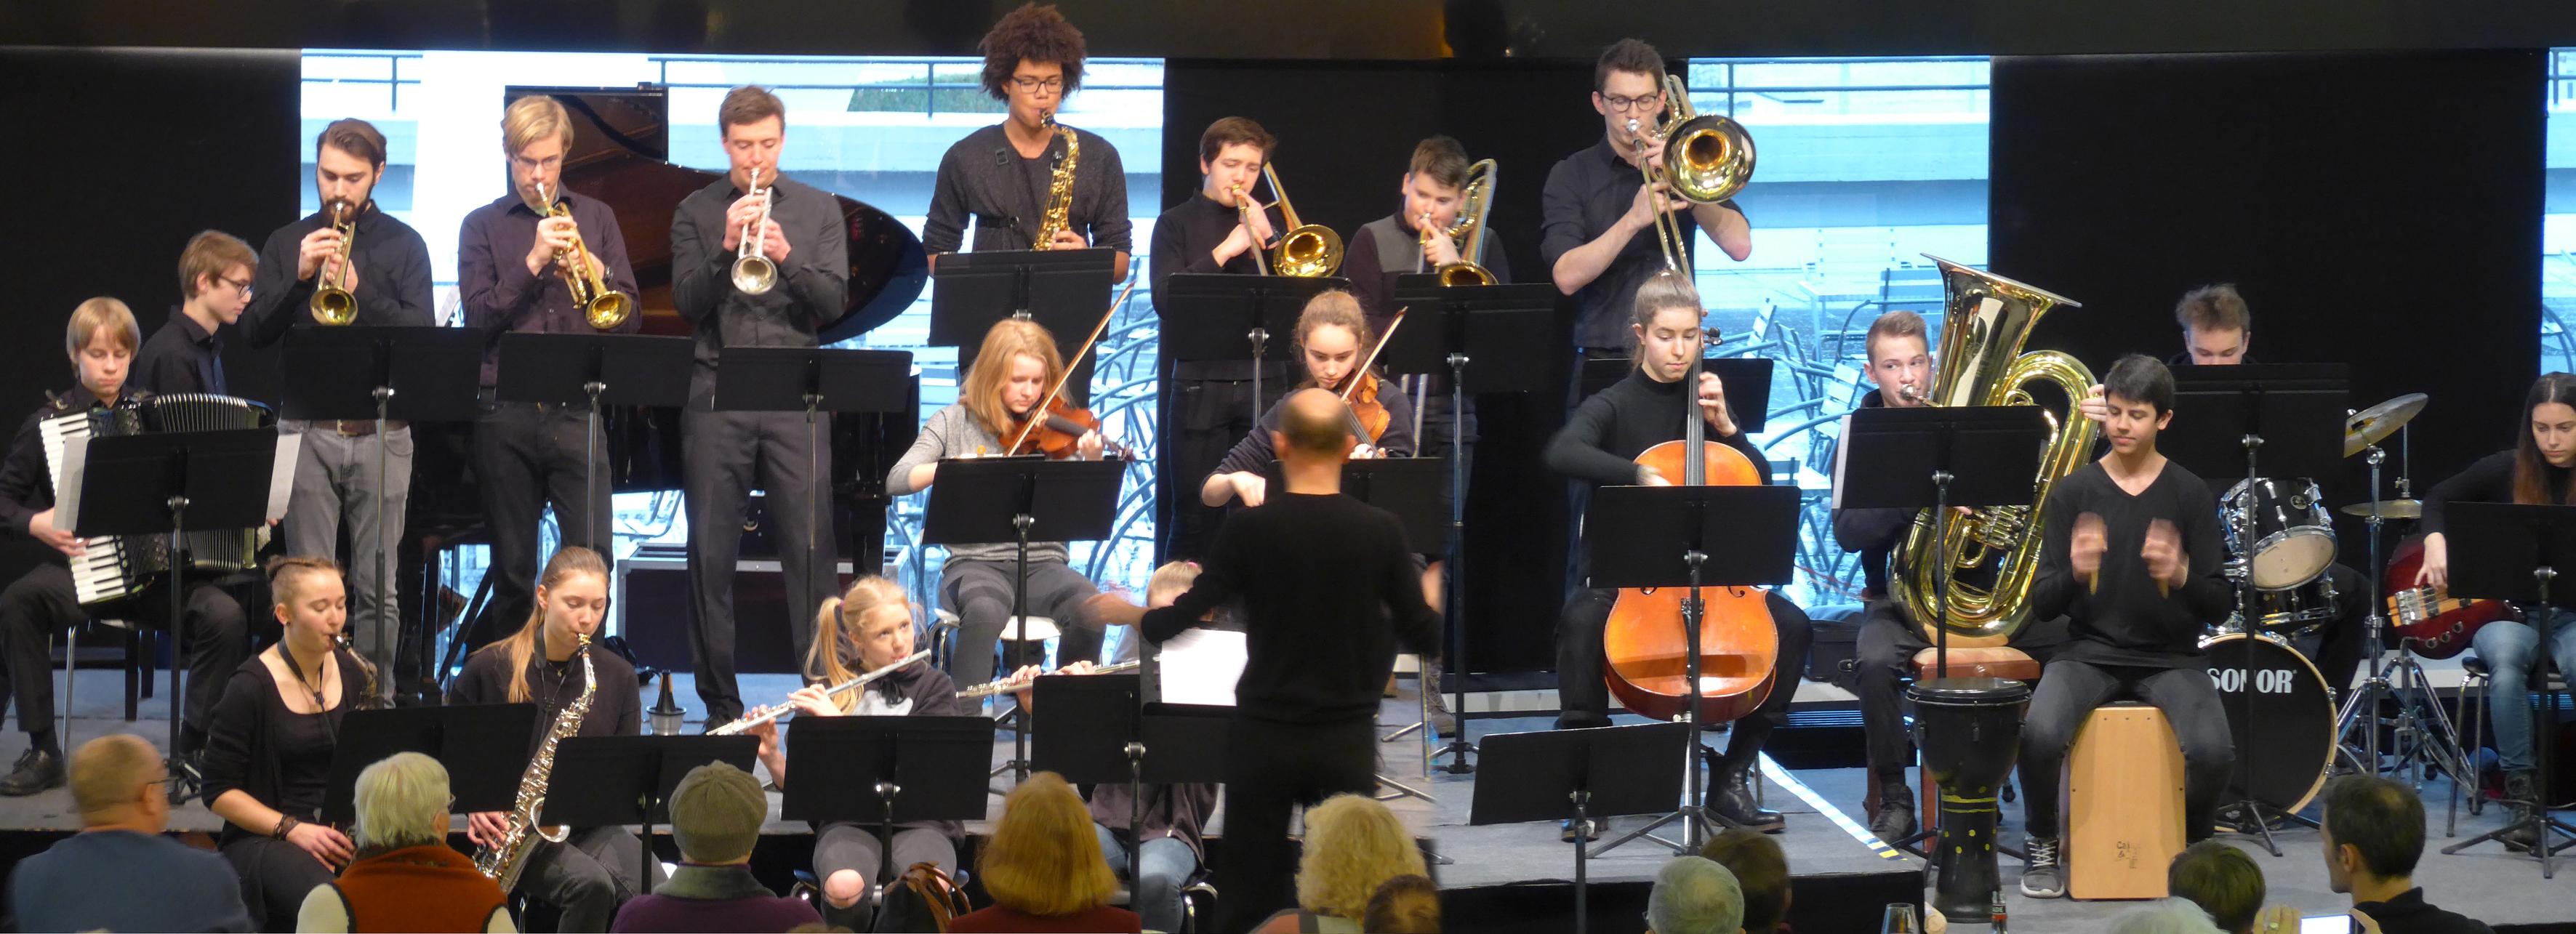 1. Darmstädter Jugend-Weltmusikorchester